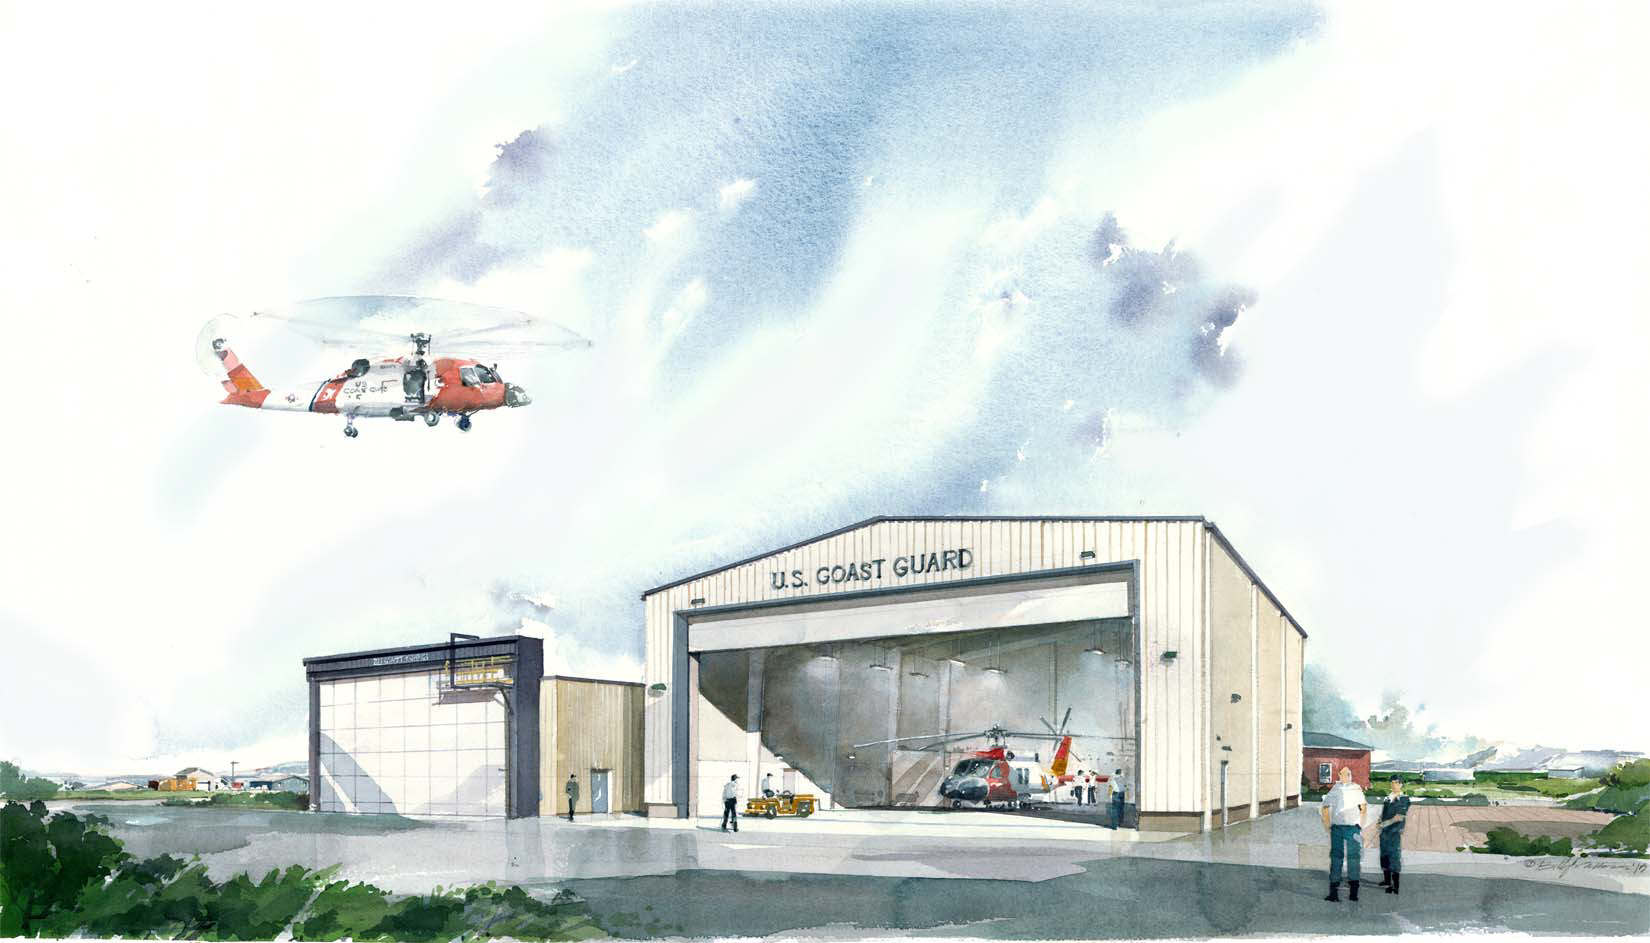 USCG FOL Cold Bay New Hangar | Cold Bay, Alaska